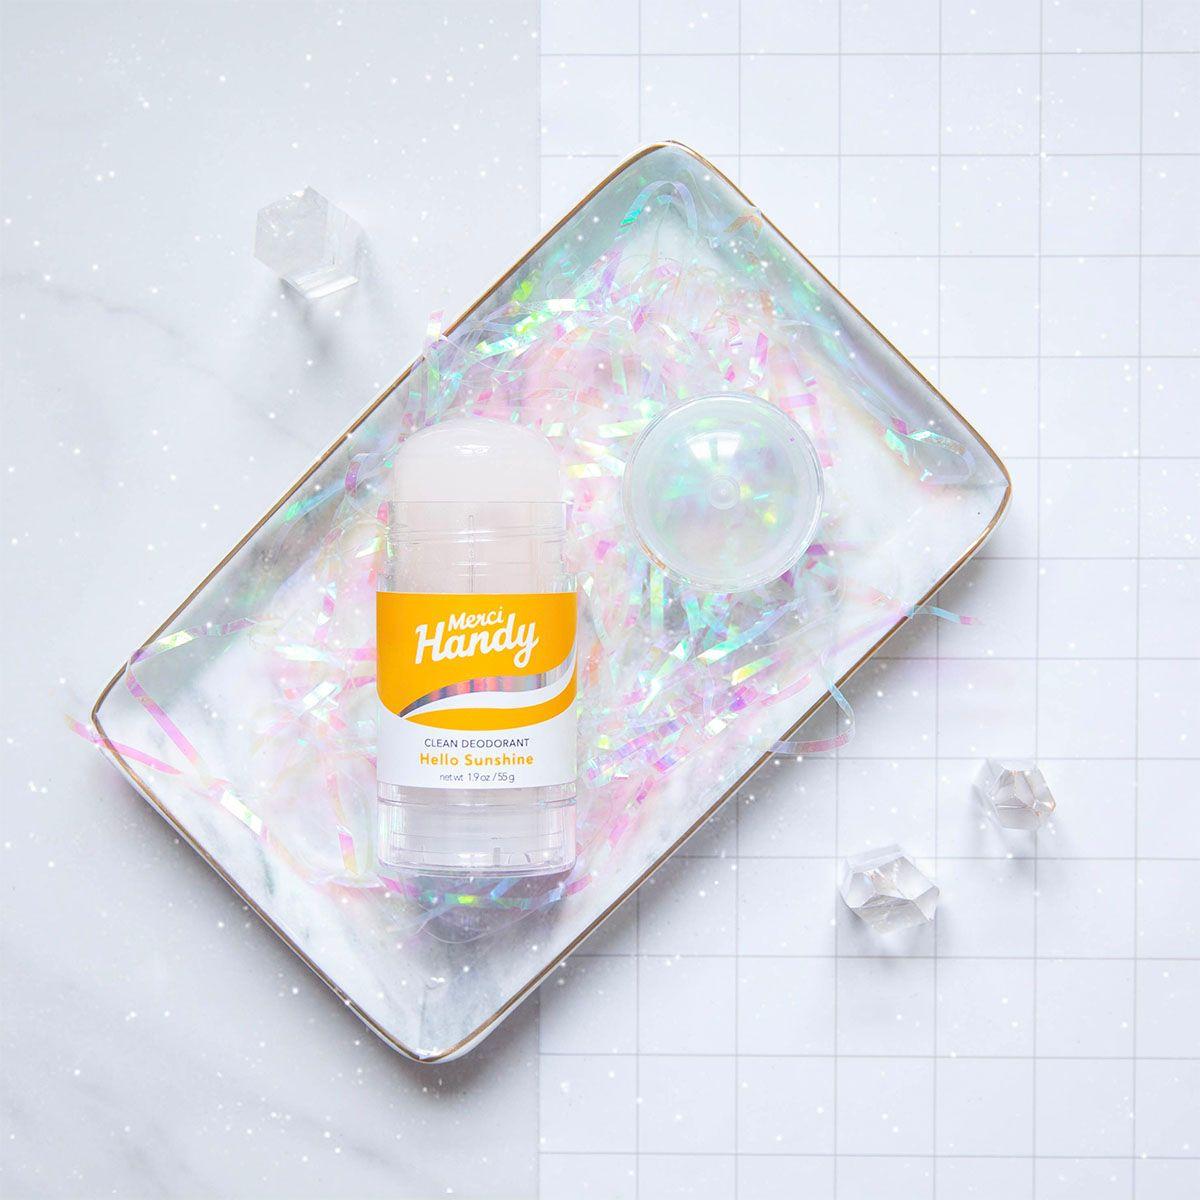 Blissim : Merci Handy - Déodorant Clean - Hello Sunshine